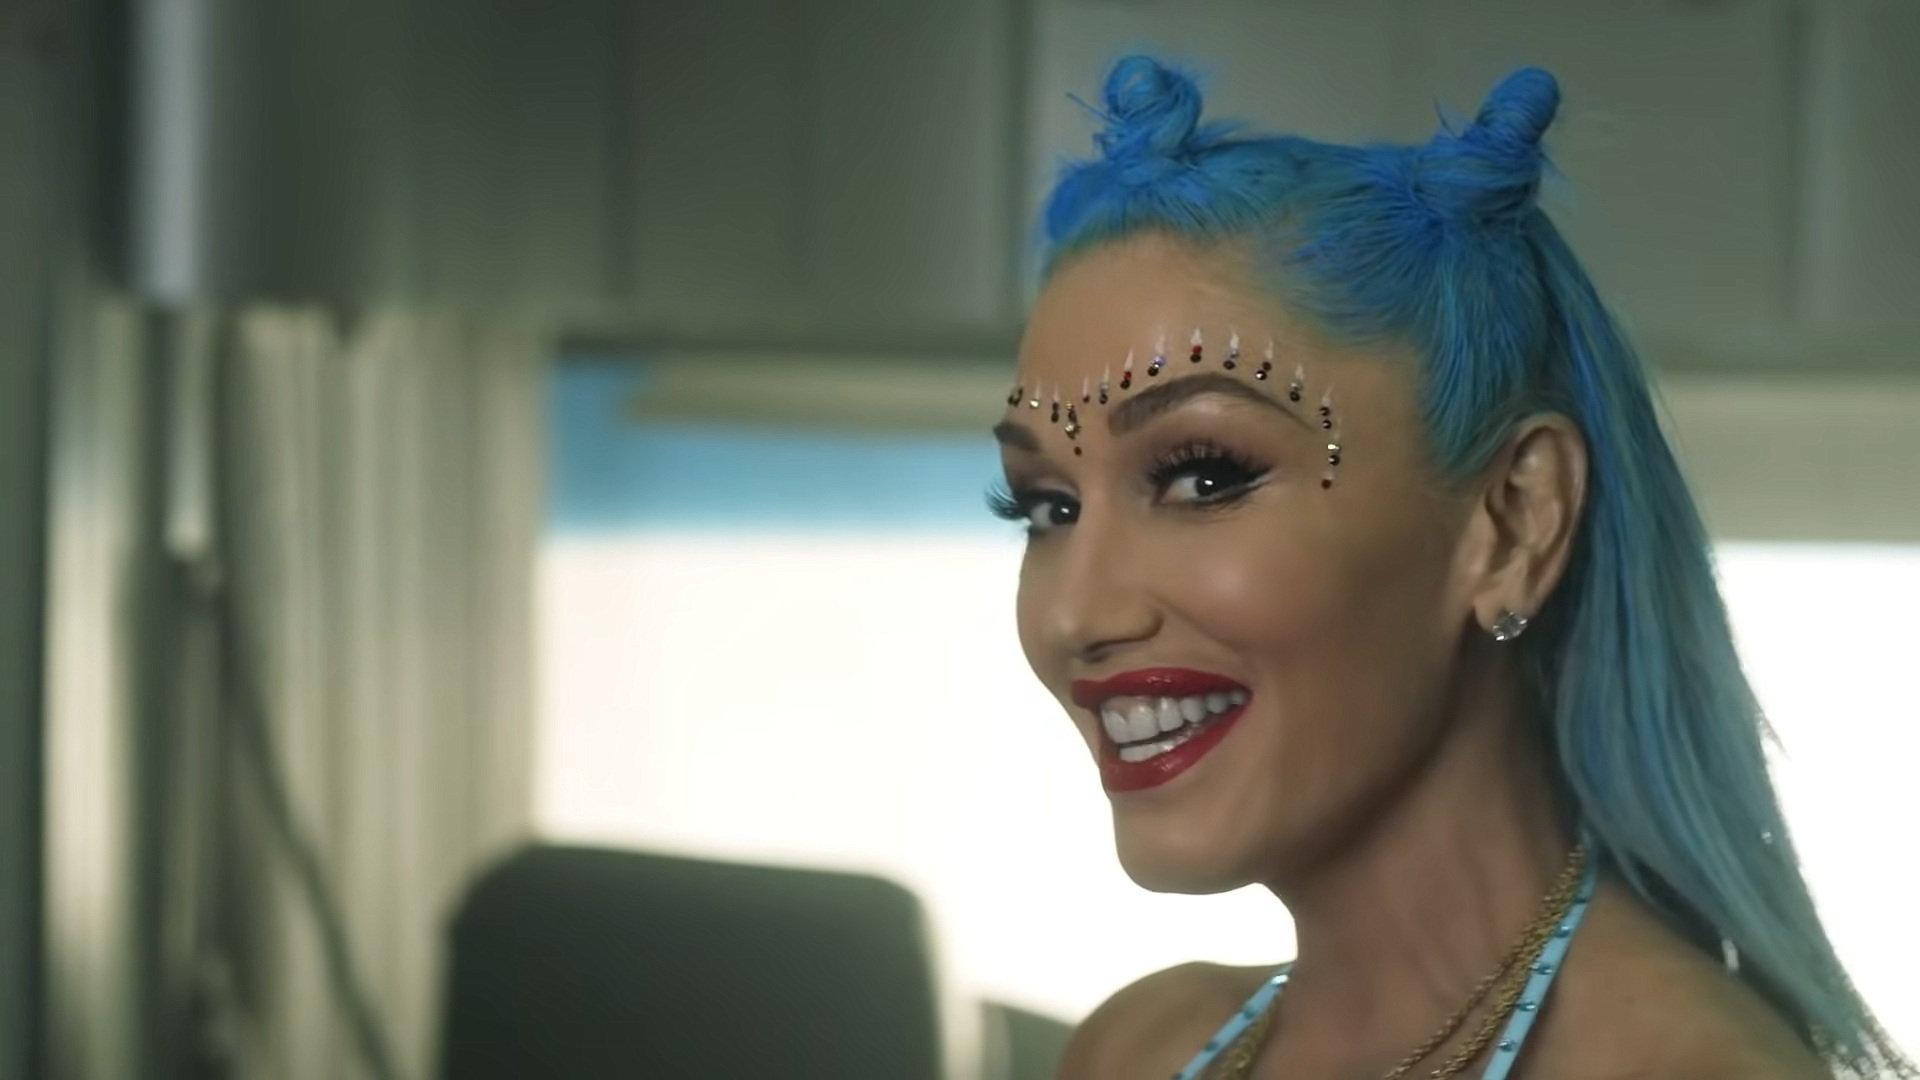 Gwen Stefani - Let Me Reintroduce Myself (Official Video) 2-25 Screenshot